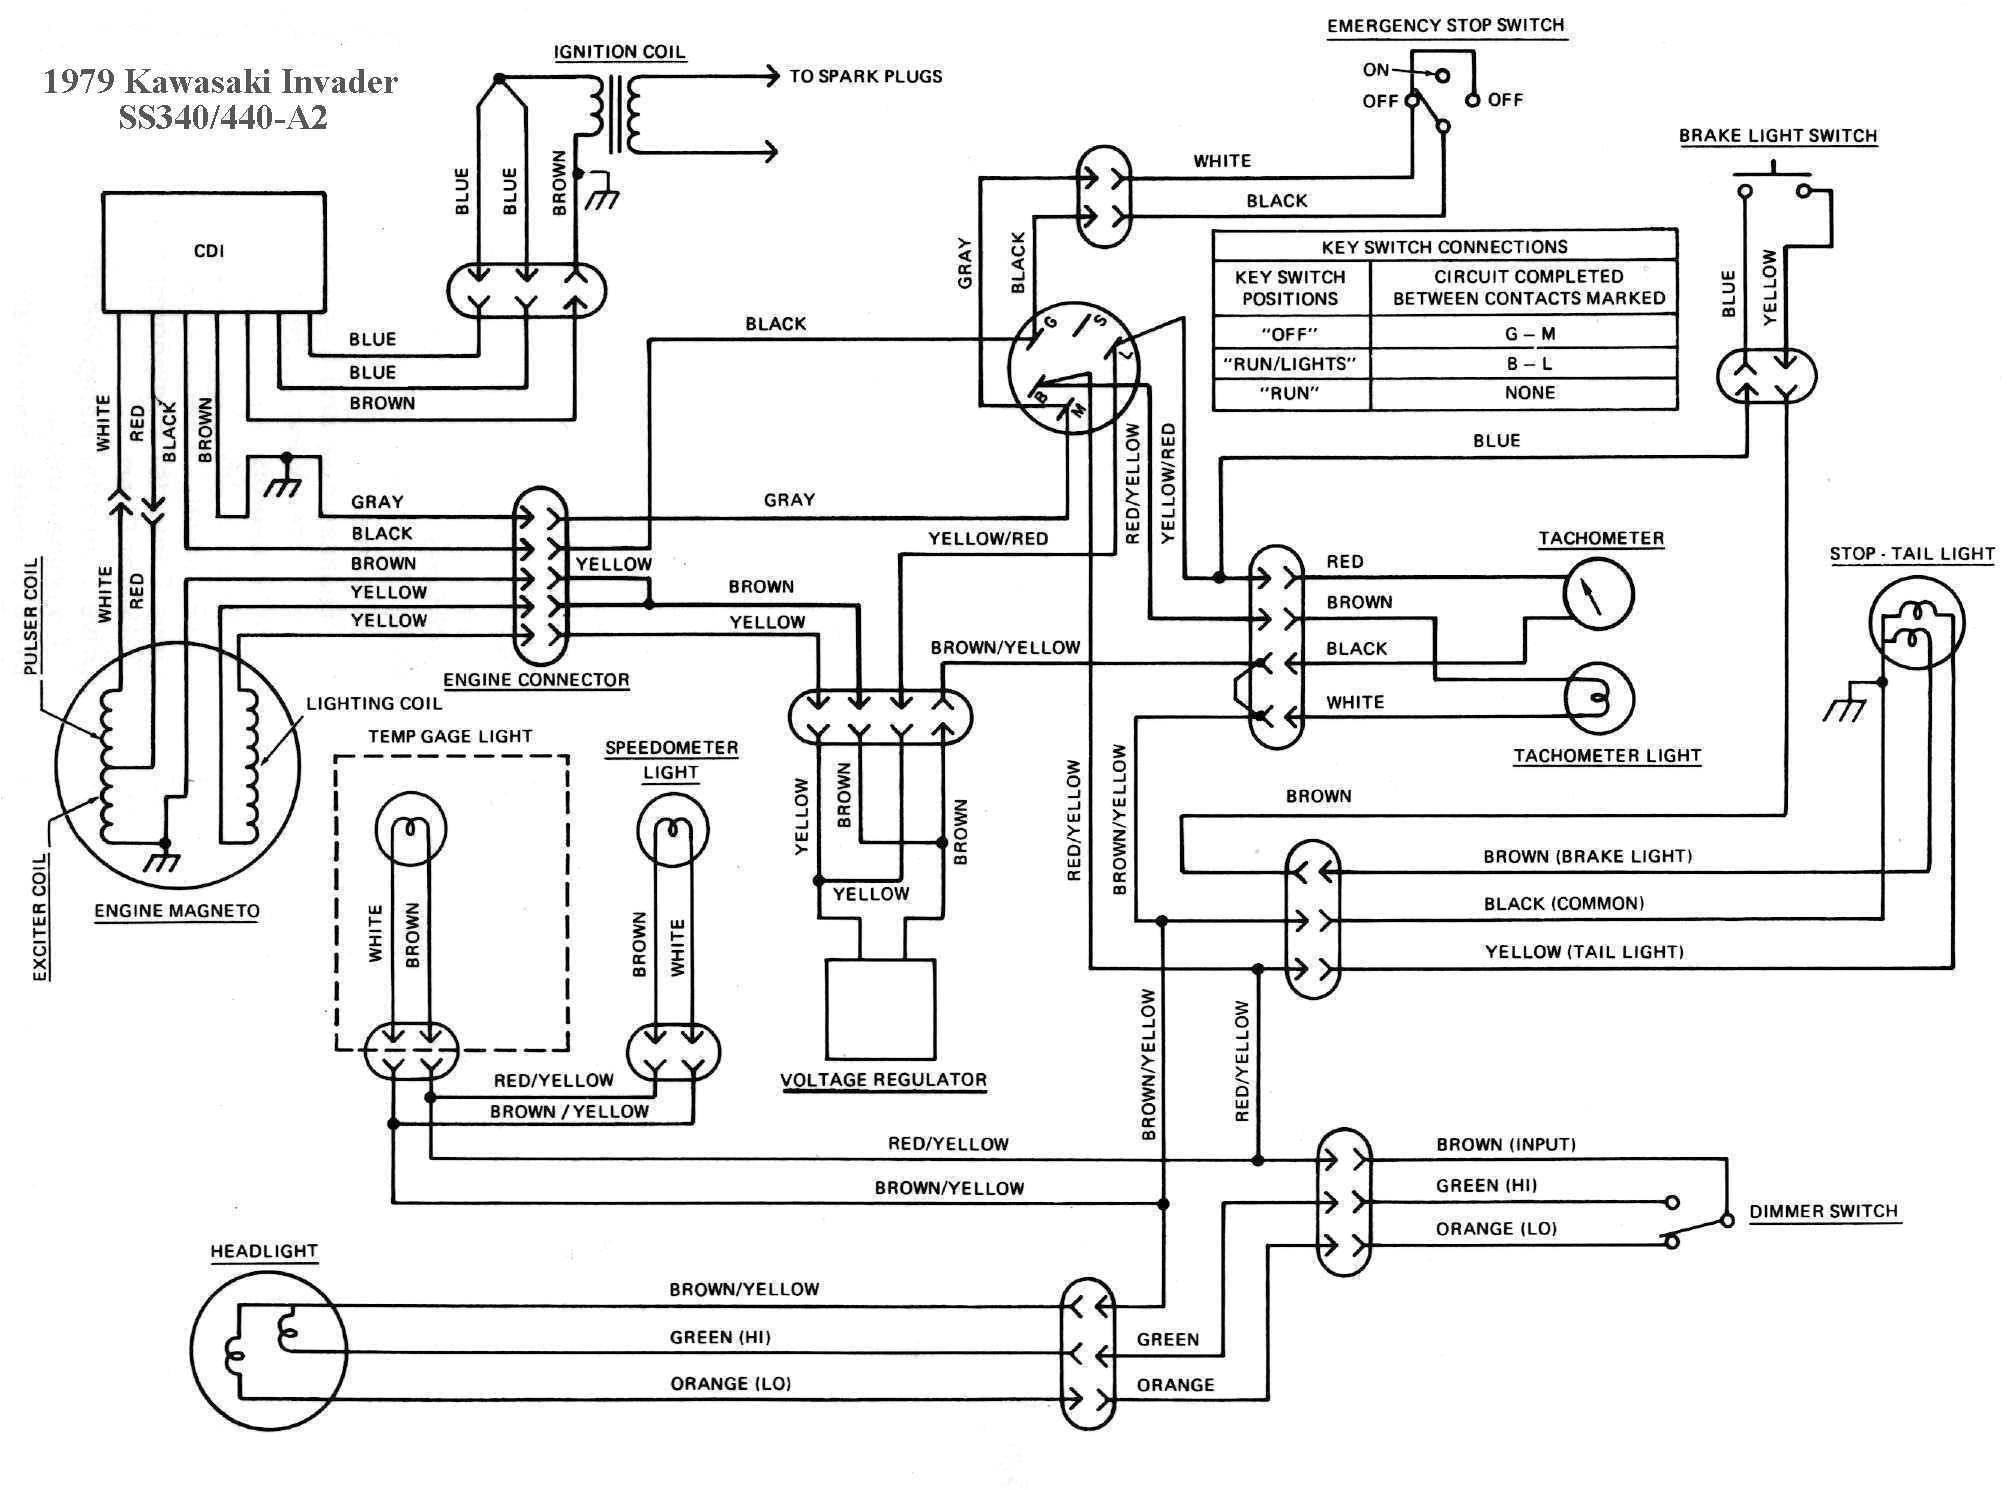 kawasaki bayou 250 wiring diagram albertasafety org kawasaki bayou 220 wiring diagram 5ab789c3c7346 for 5 in